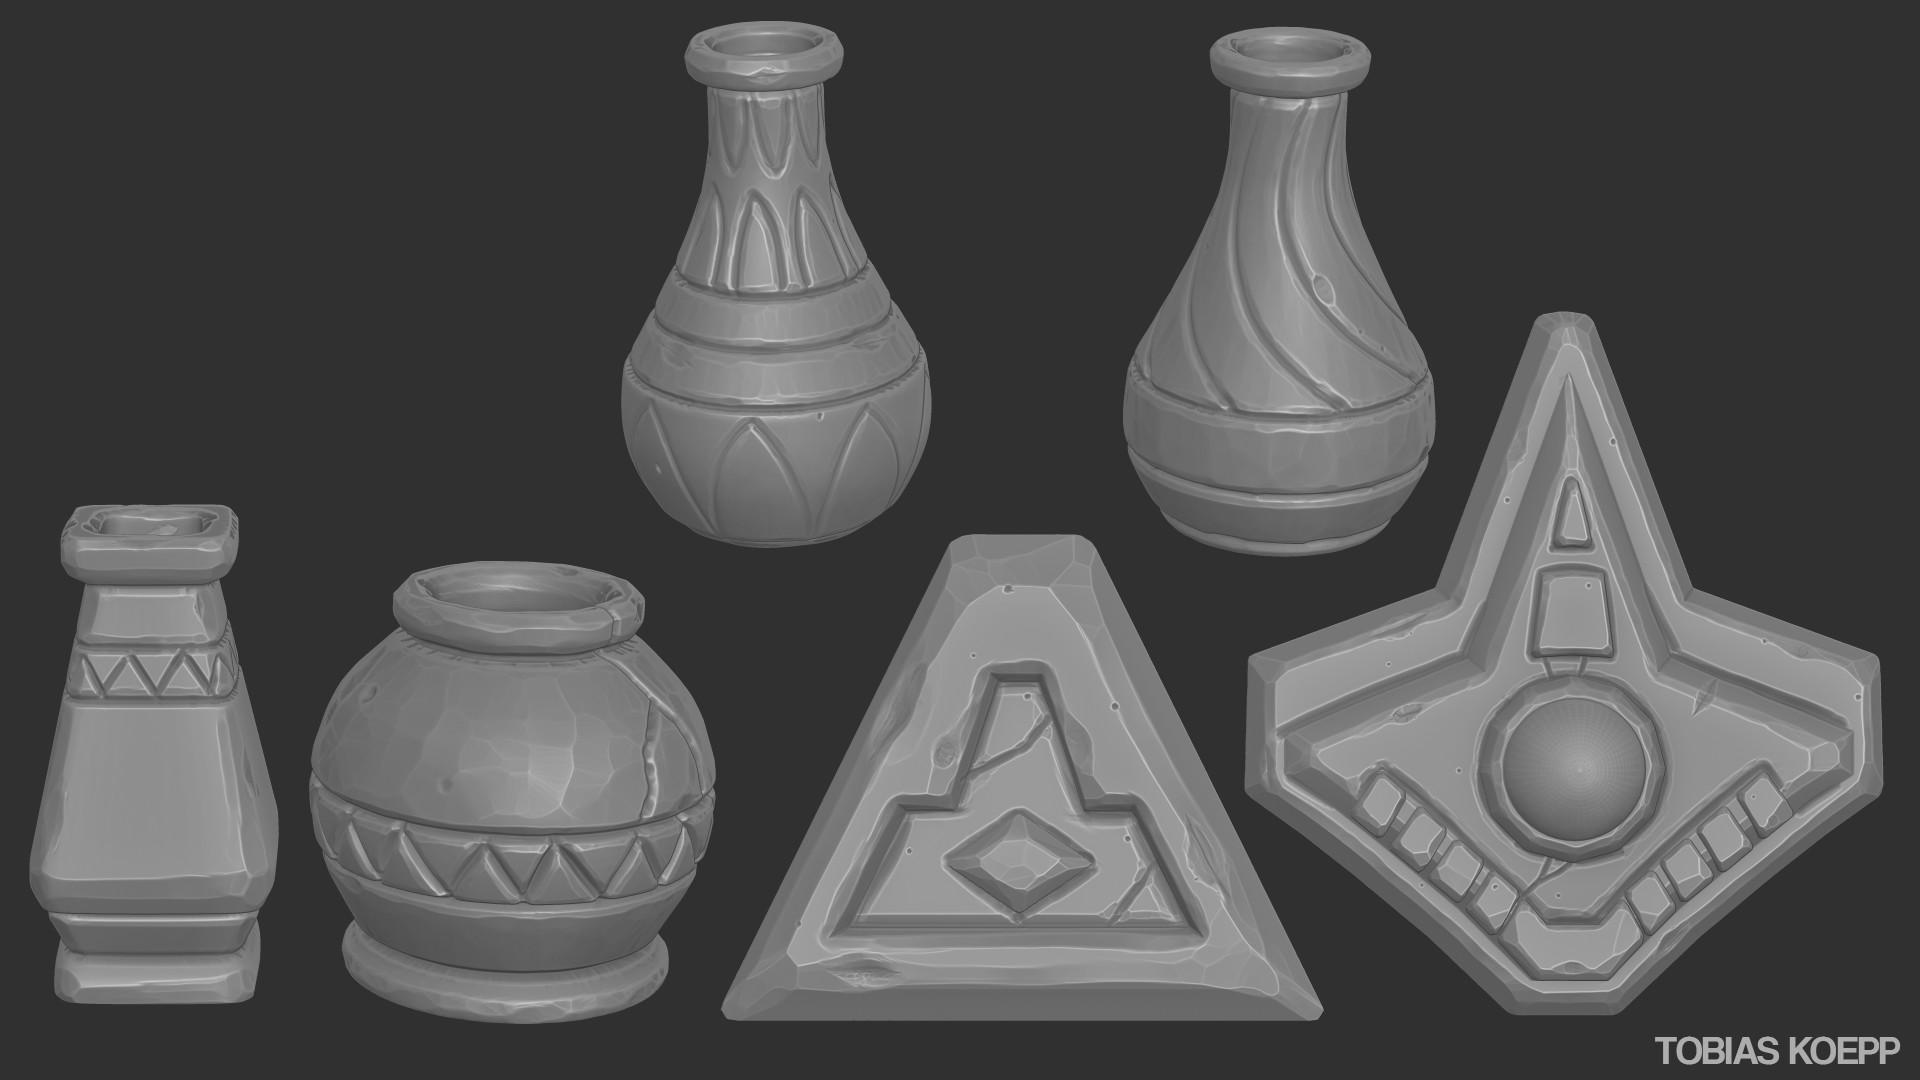 Tobias koepp vases